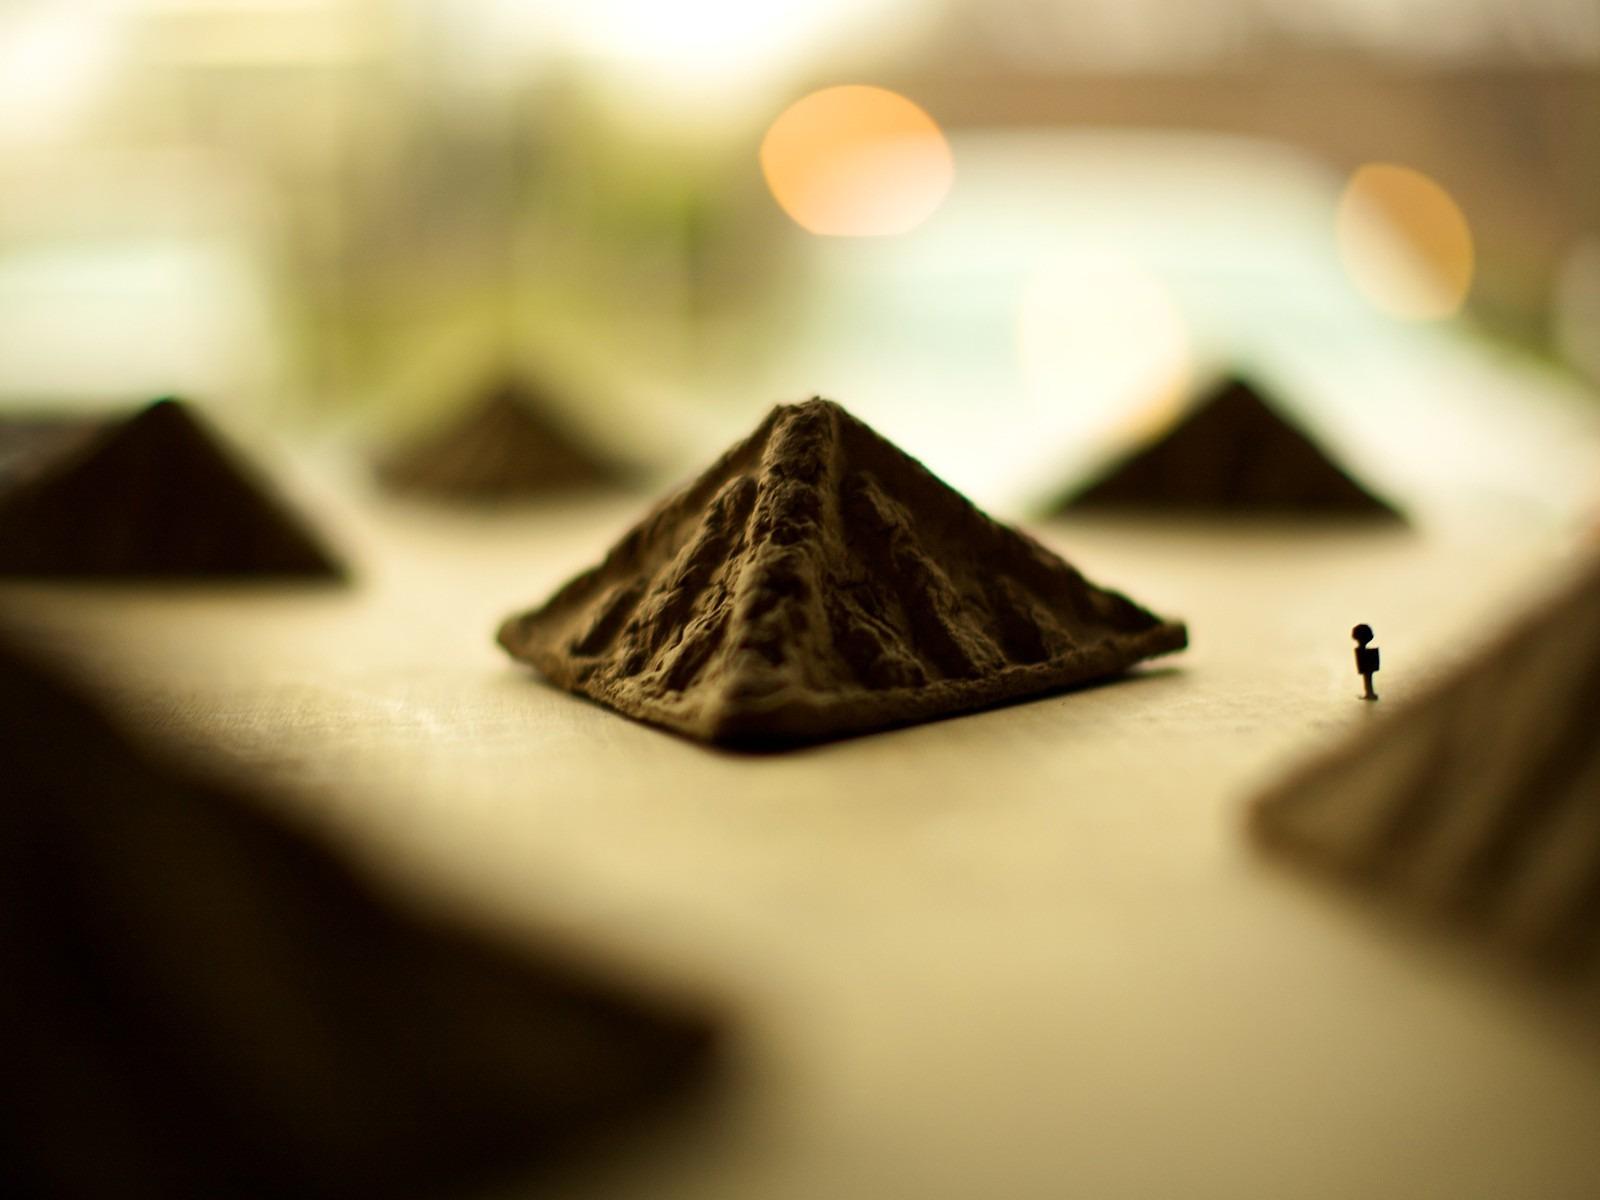 Miniature Pyramids Life Photography Hd Wallpaper Preview 10wallpaper Com